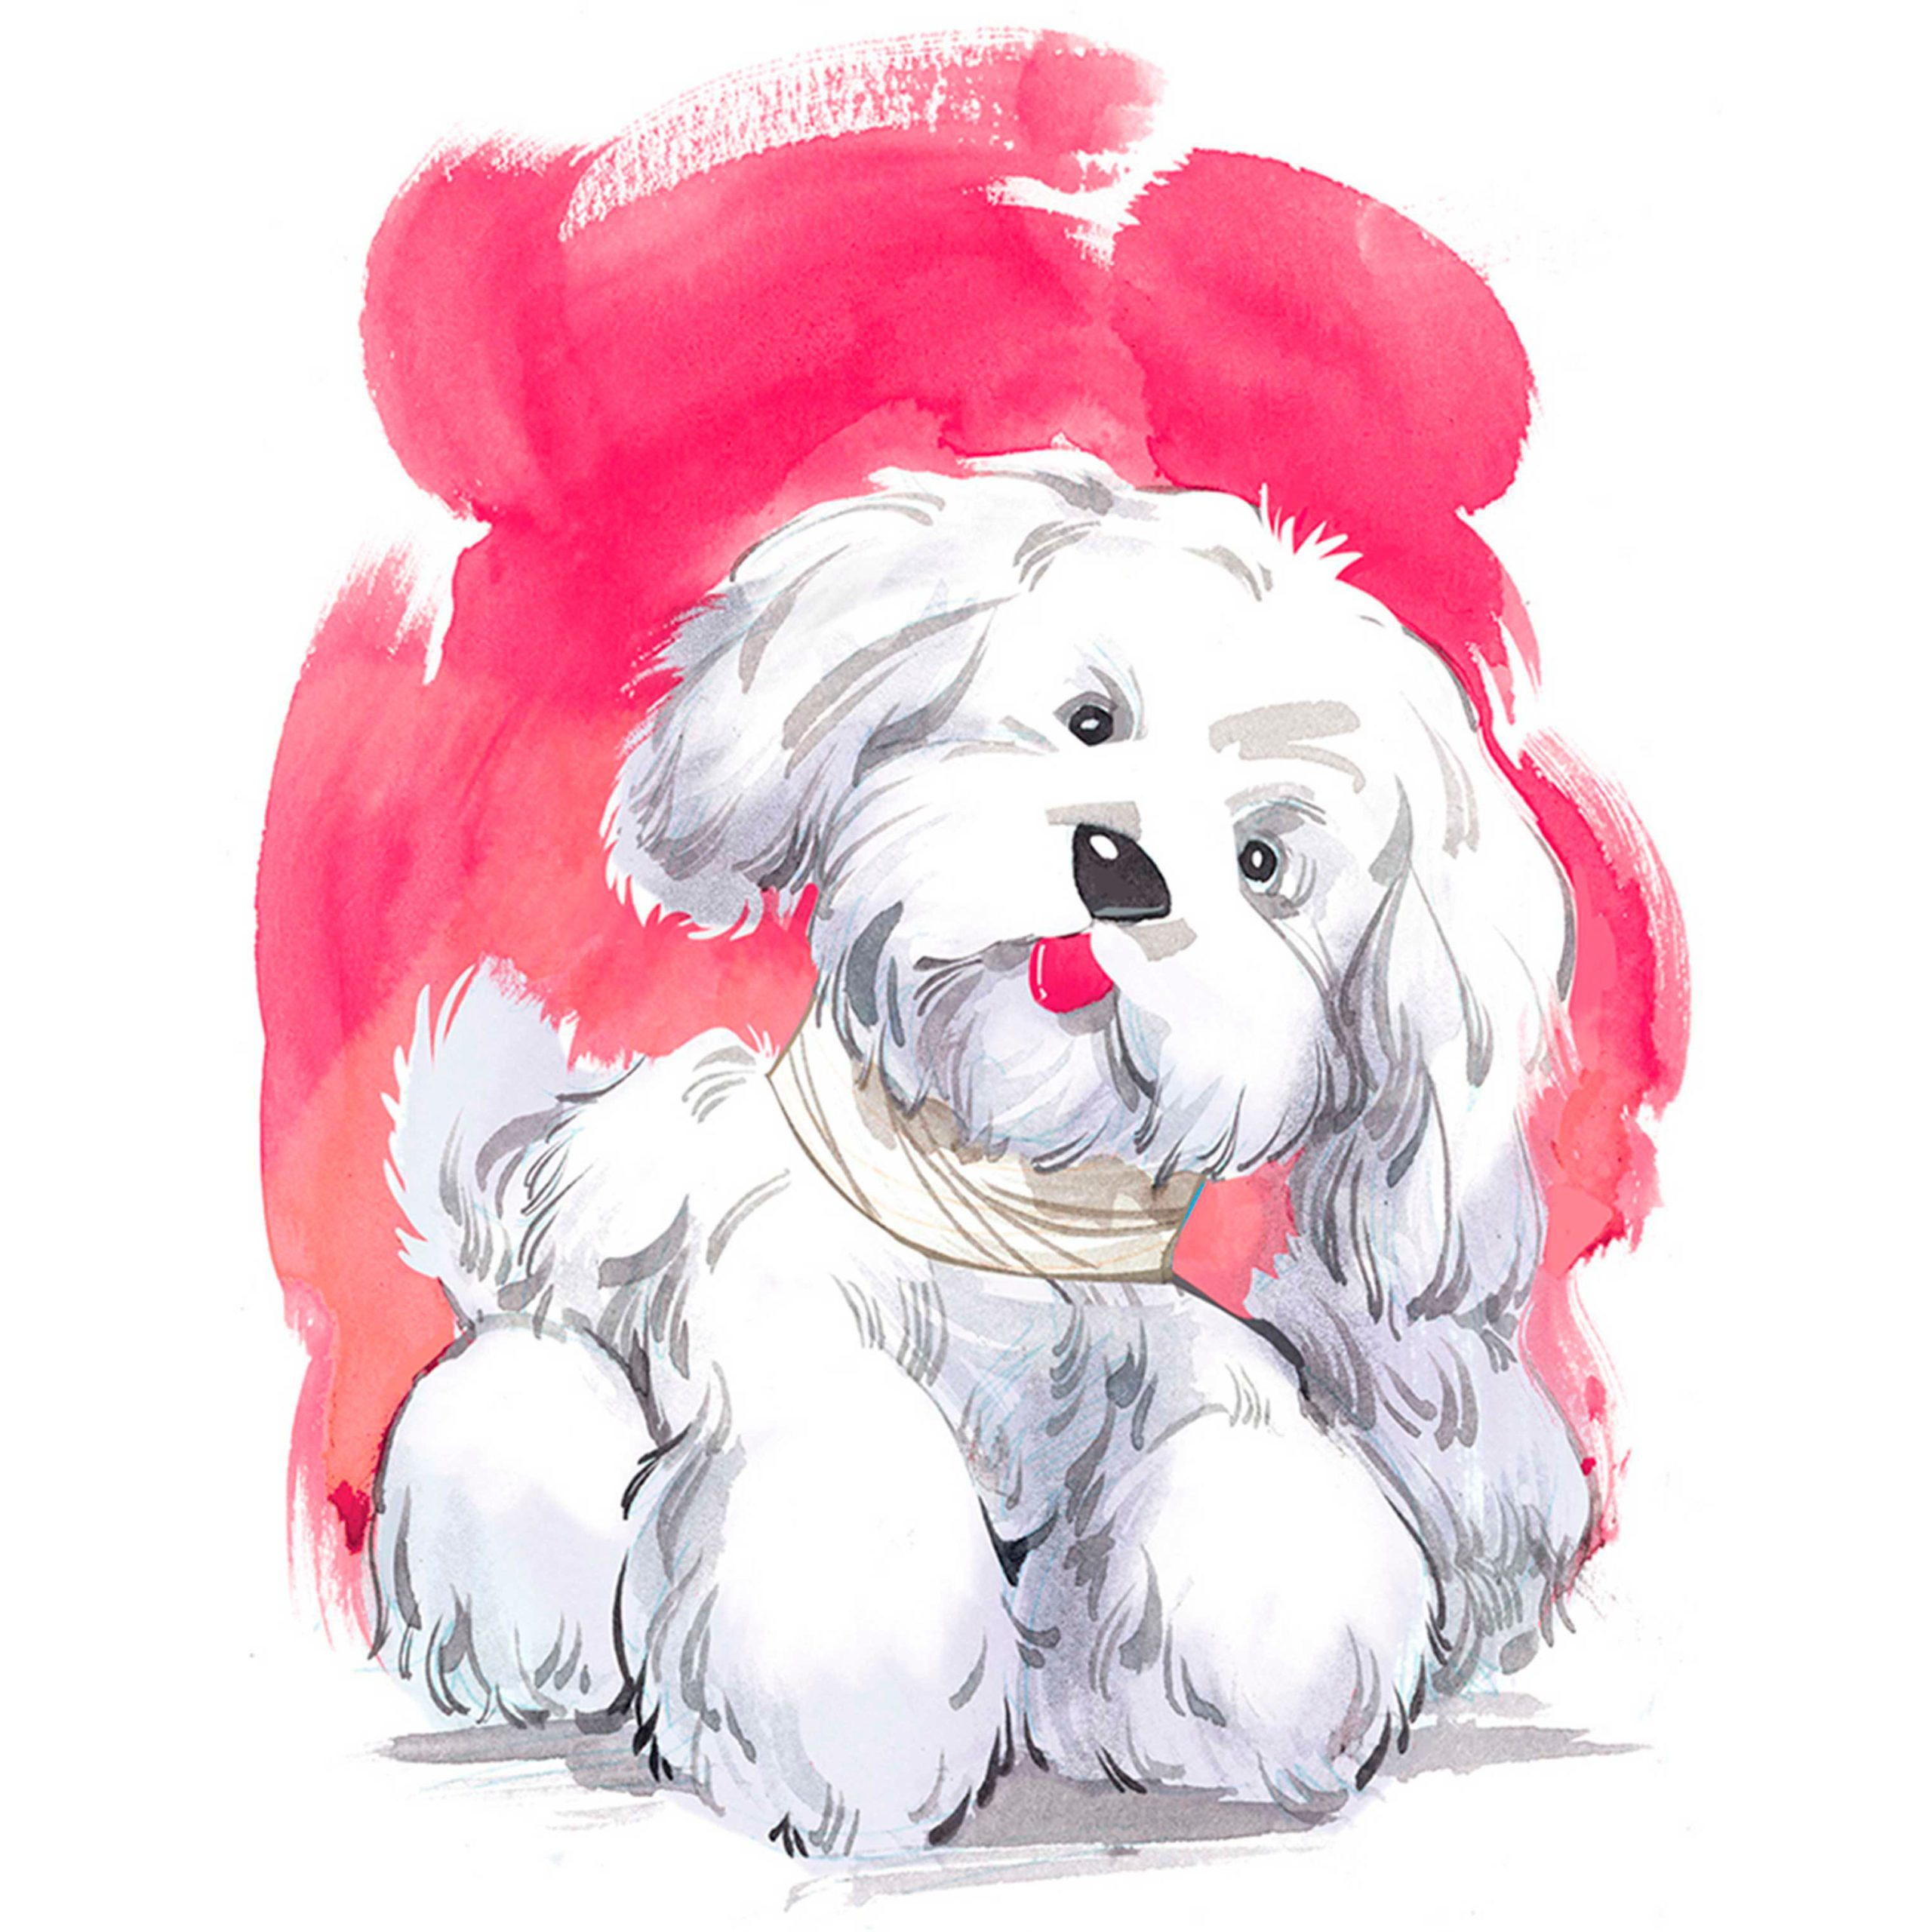 illustration of a white dog